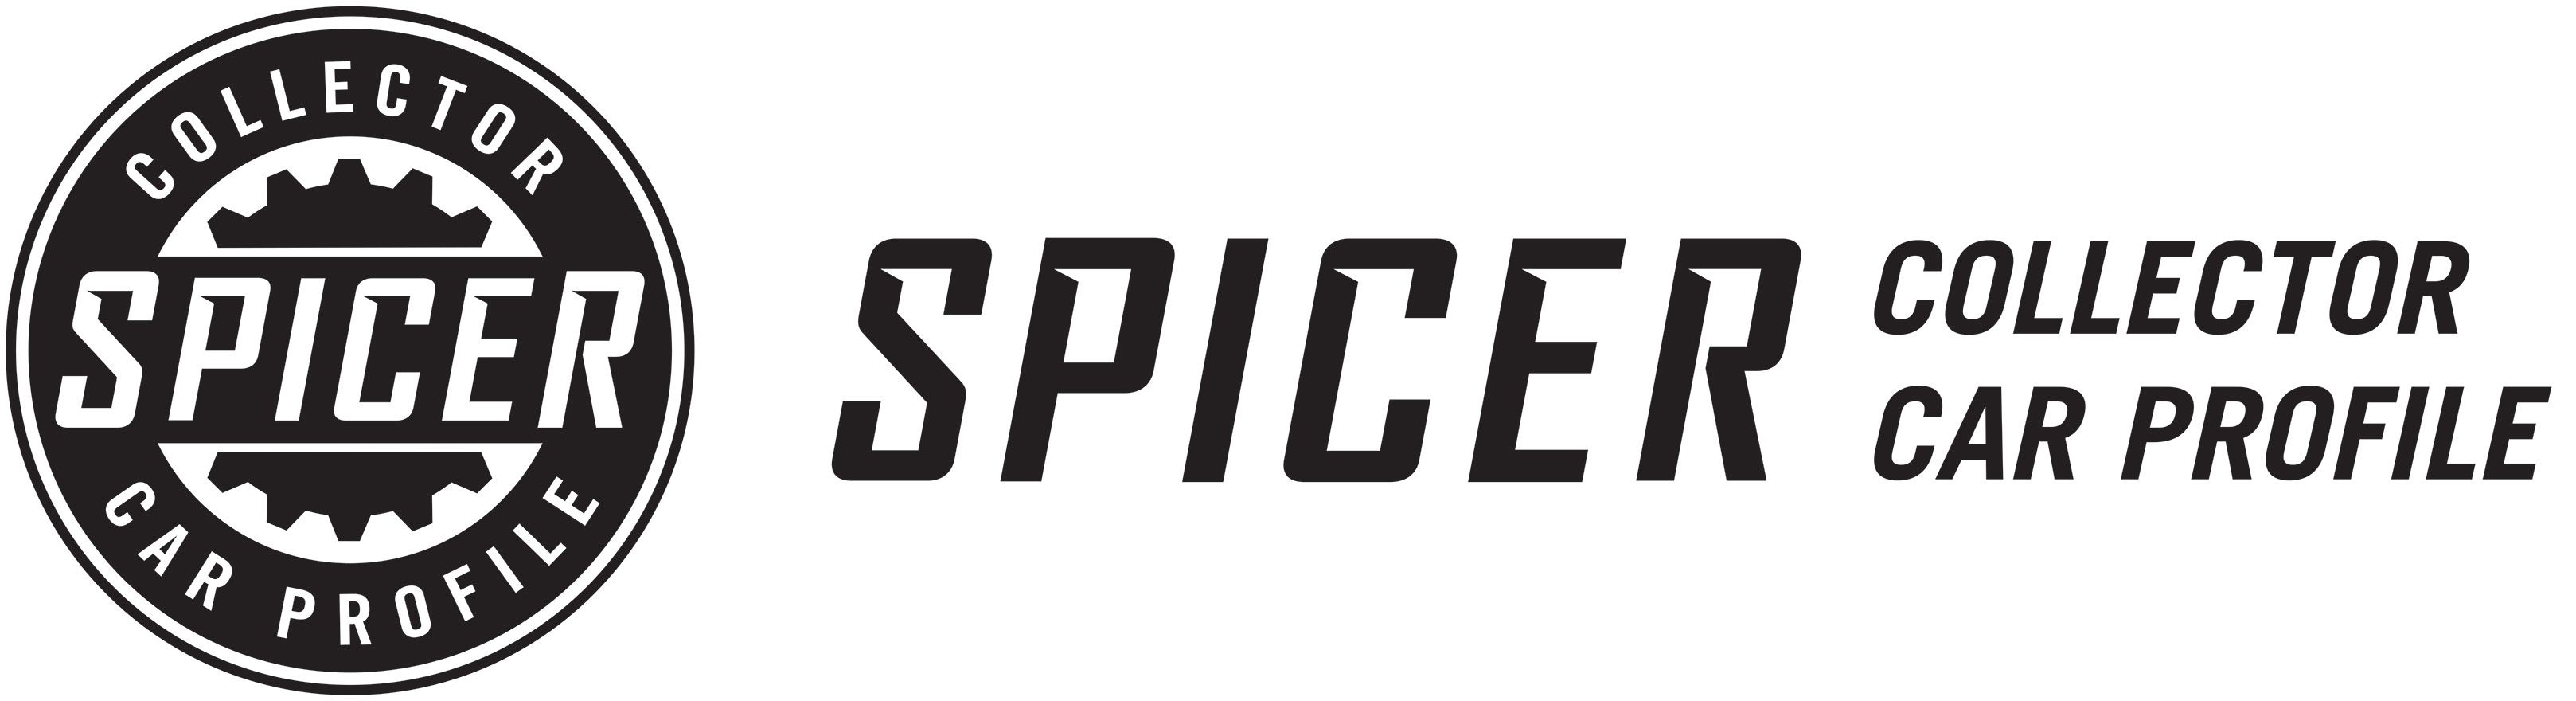 Spicer Collector Car Profile